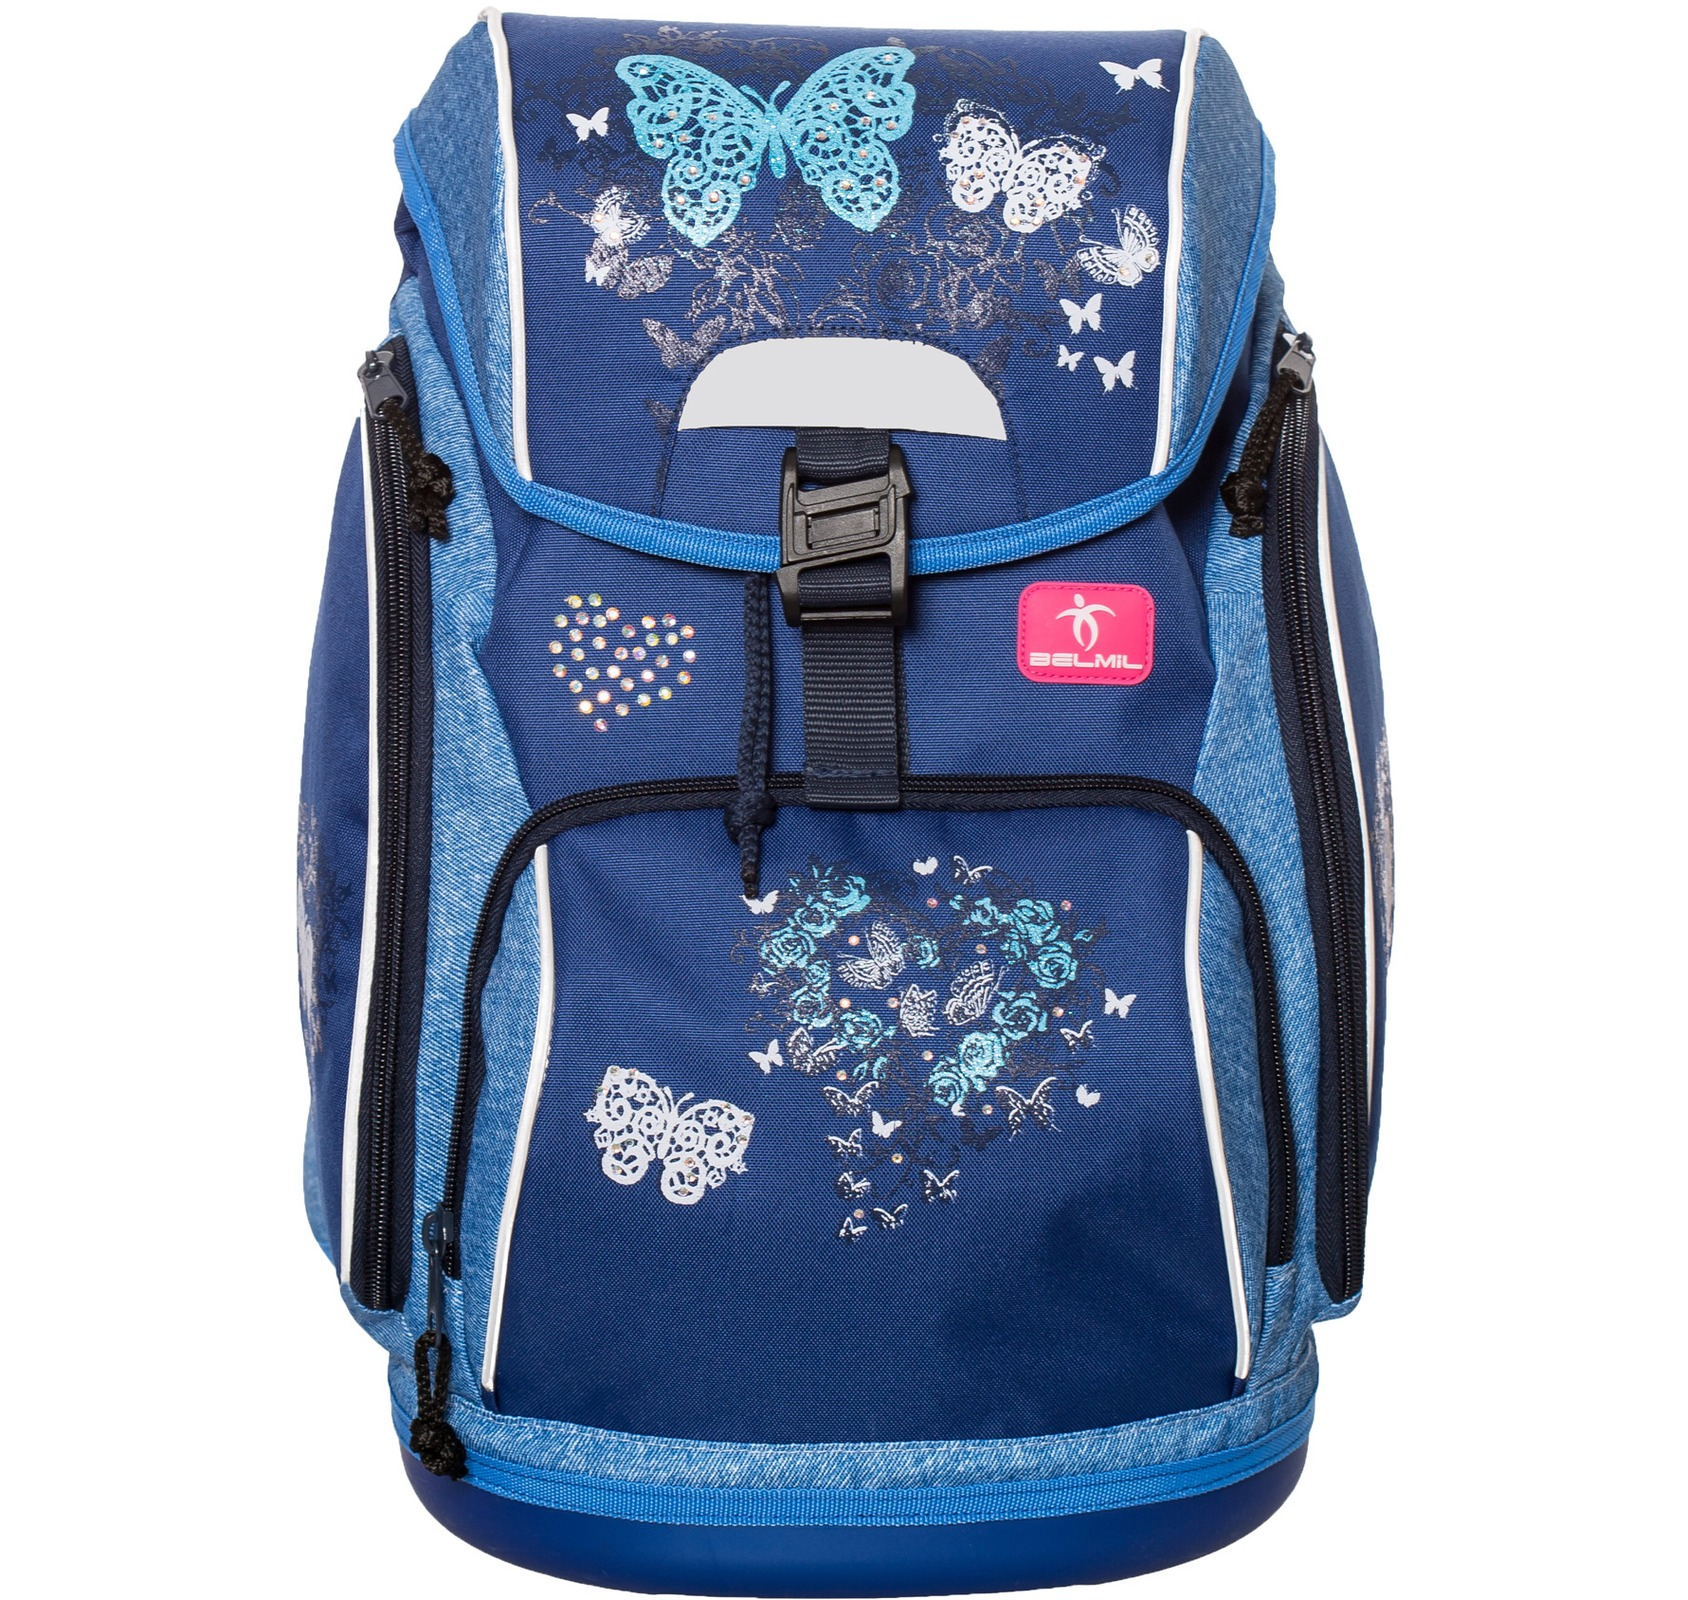 Ранец-рюкзак Belmil 404-31/467 цвет Butterfly Новинка, - фото 1